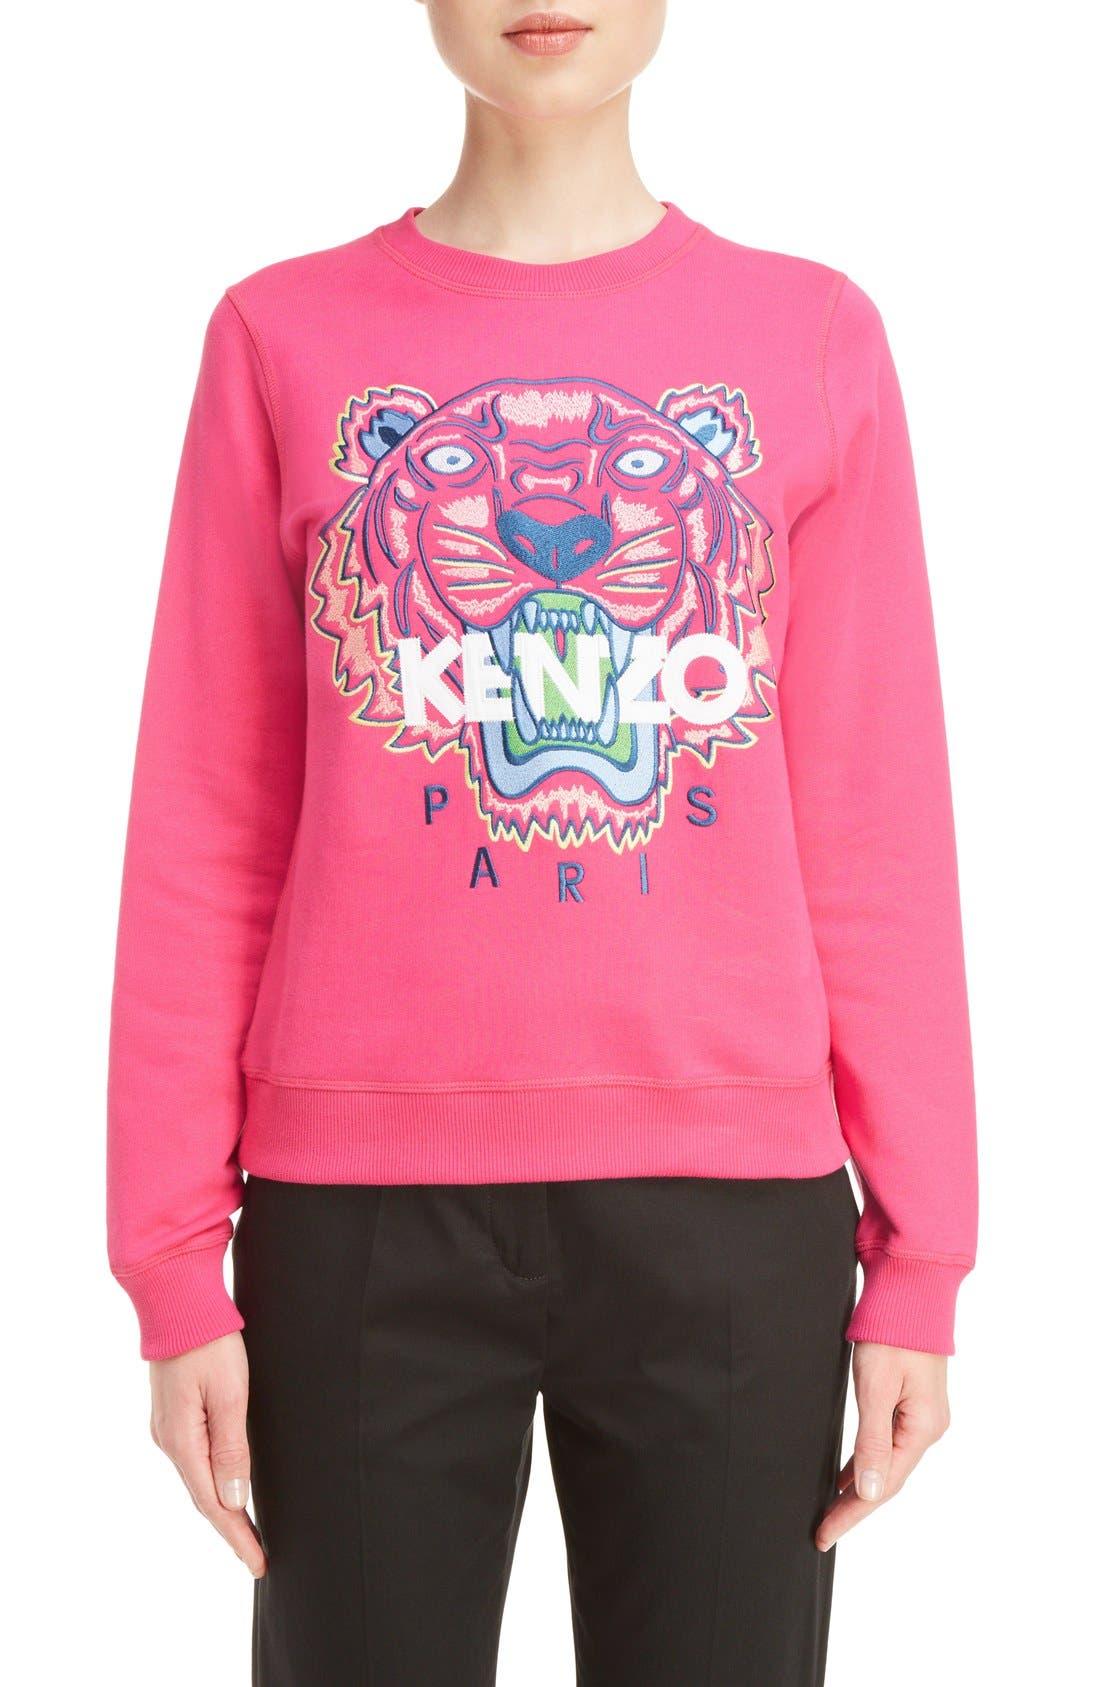 Main Image - KENZO Embroidered Tiger Cotton Sweatshirt